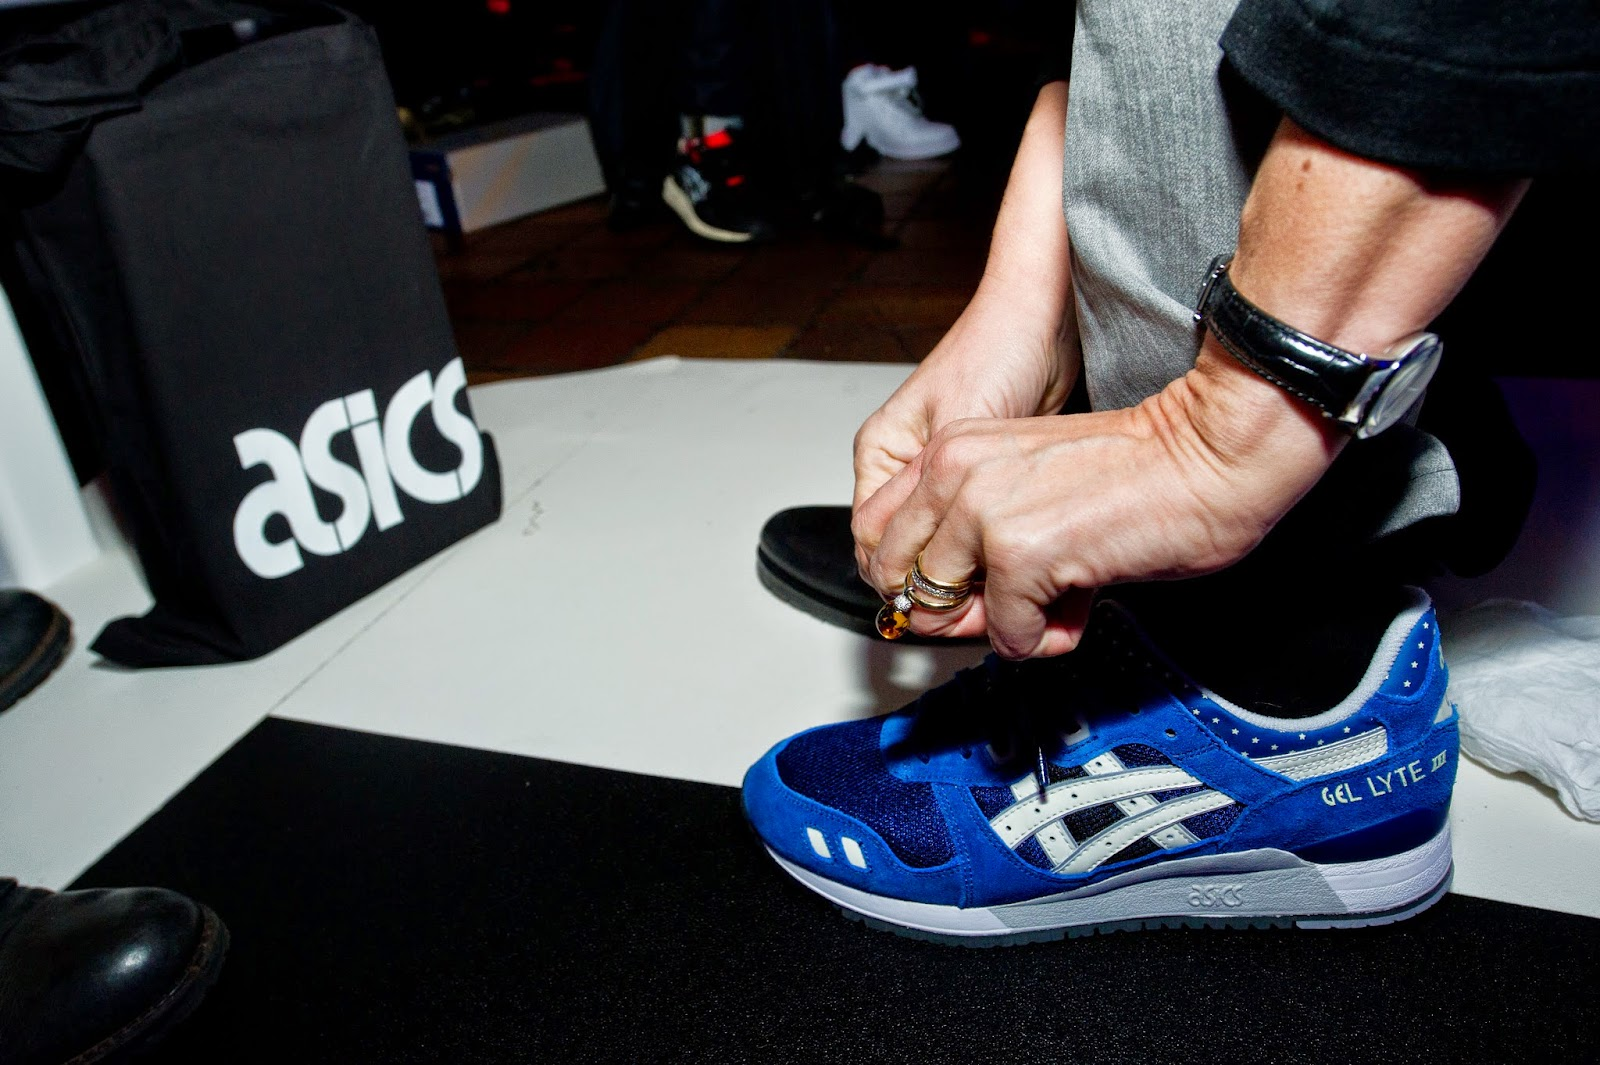 Onitsuka Tiger, Asics, Asics Lifestyle, Asics Tiger, Gel-Lyte III, Gel Saga, lifestyle, sportwear, Suits and Shirts, sneakers, calzado, zapatillas,